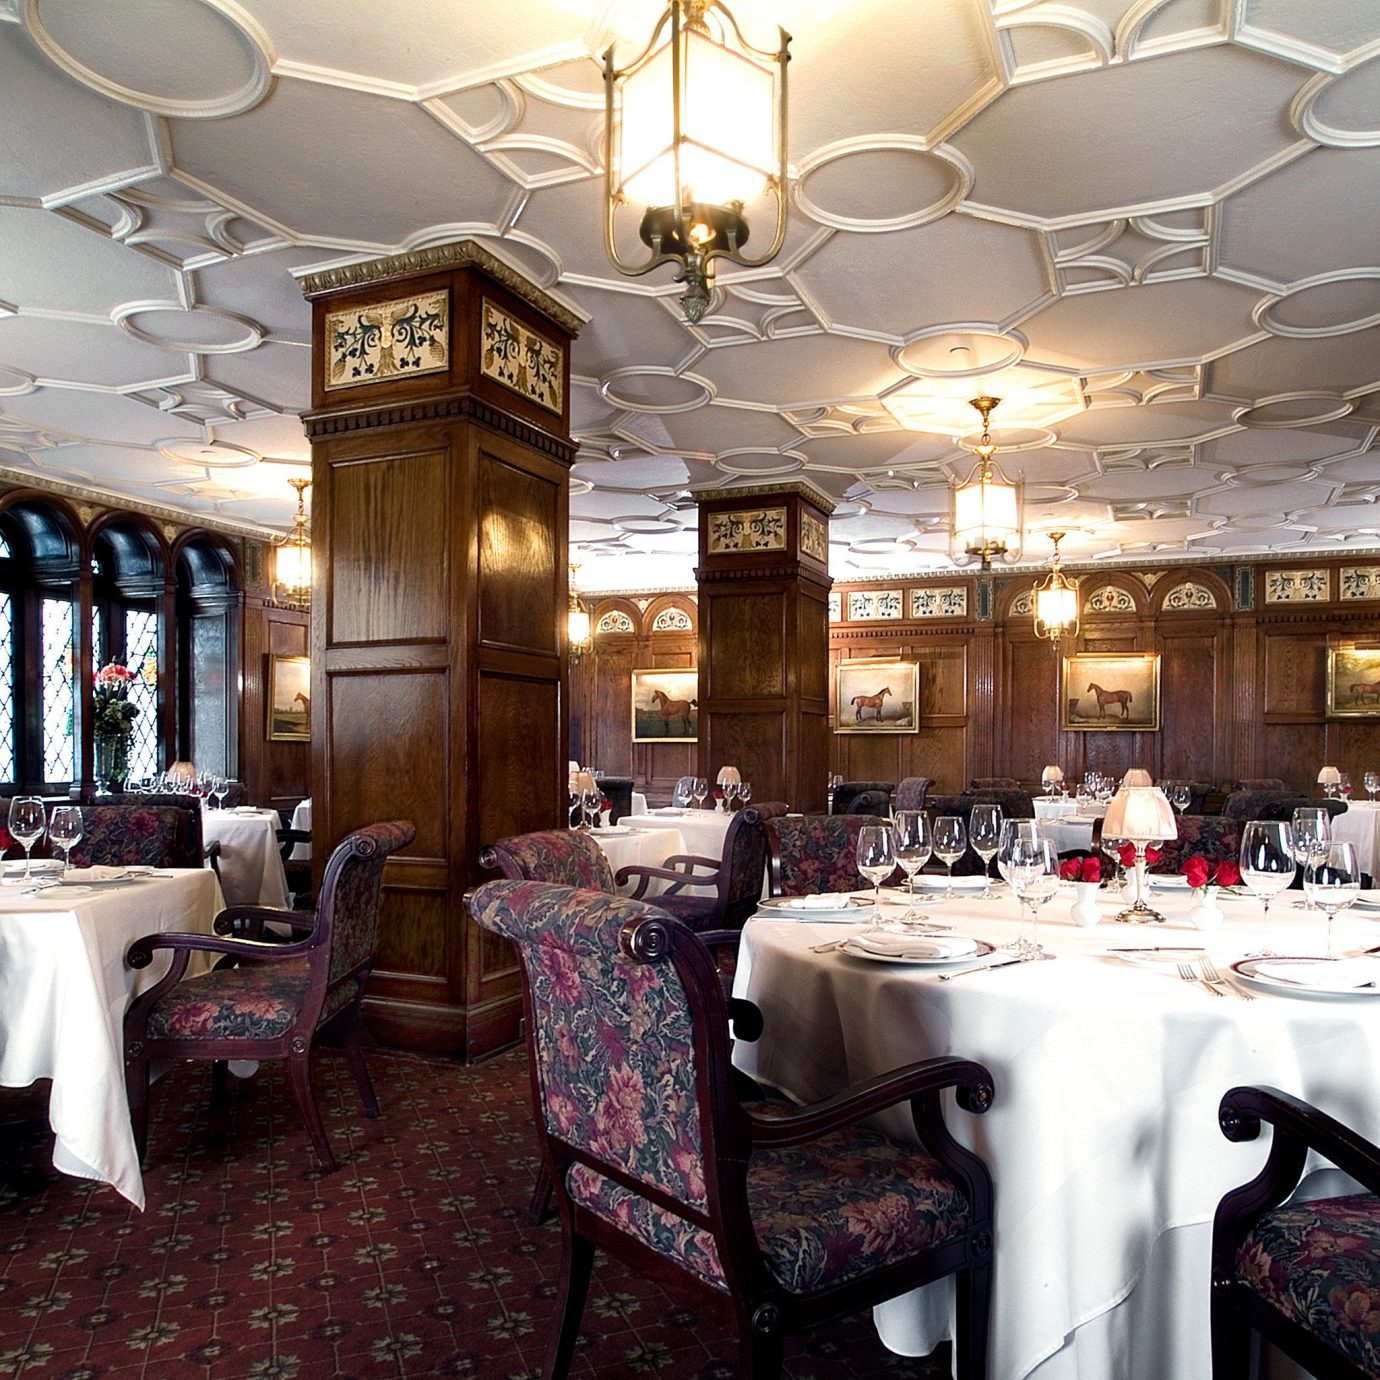 Dining Drink Eat Elegant Historic Lounge Luxury Modern function hall restaurant ballroom banquet